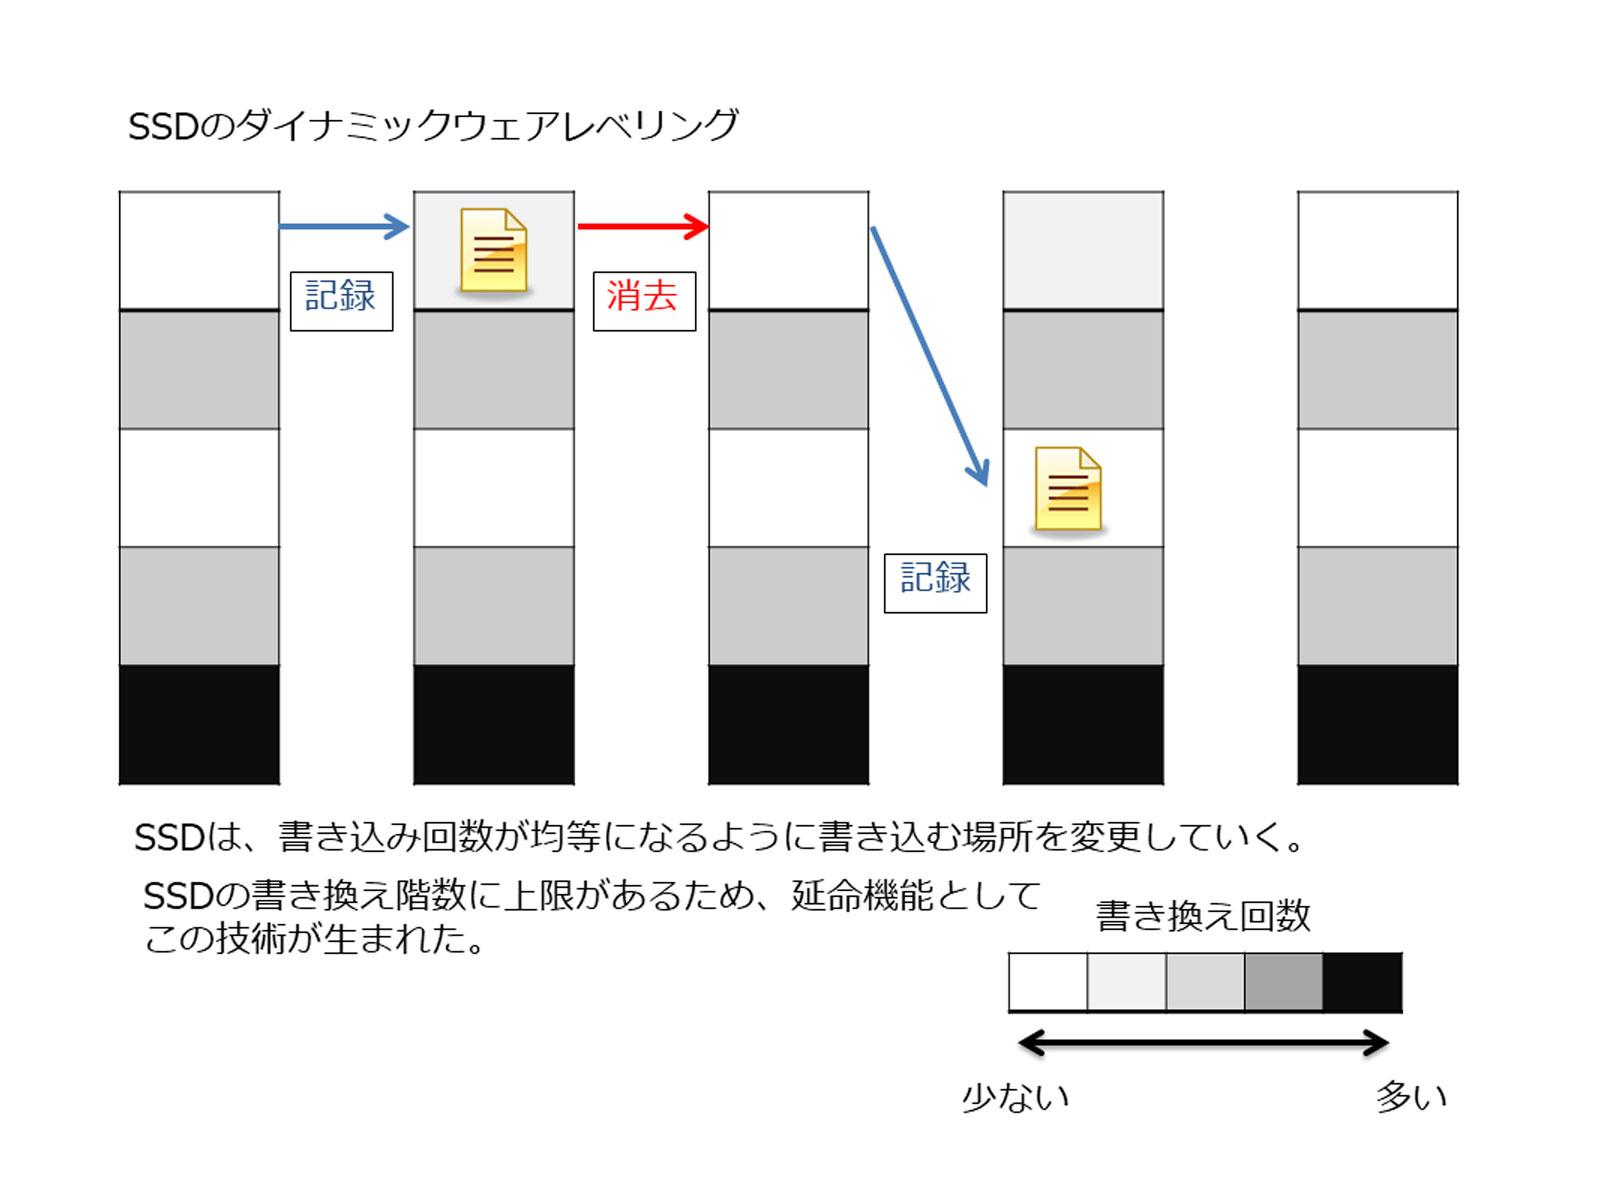 SSDのダイナミックウェアレベリング機能説明